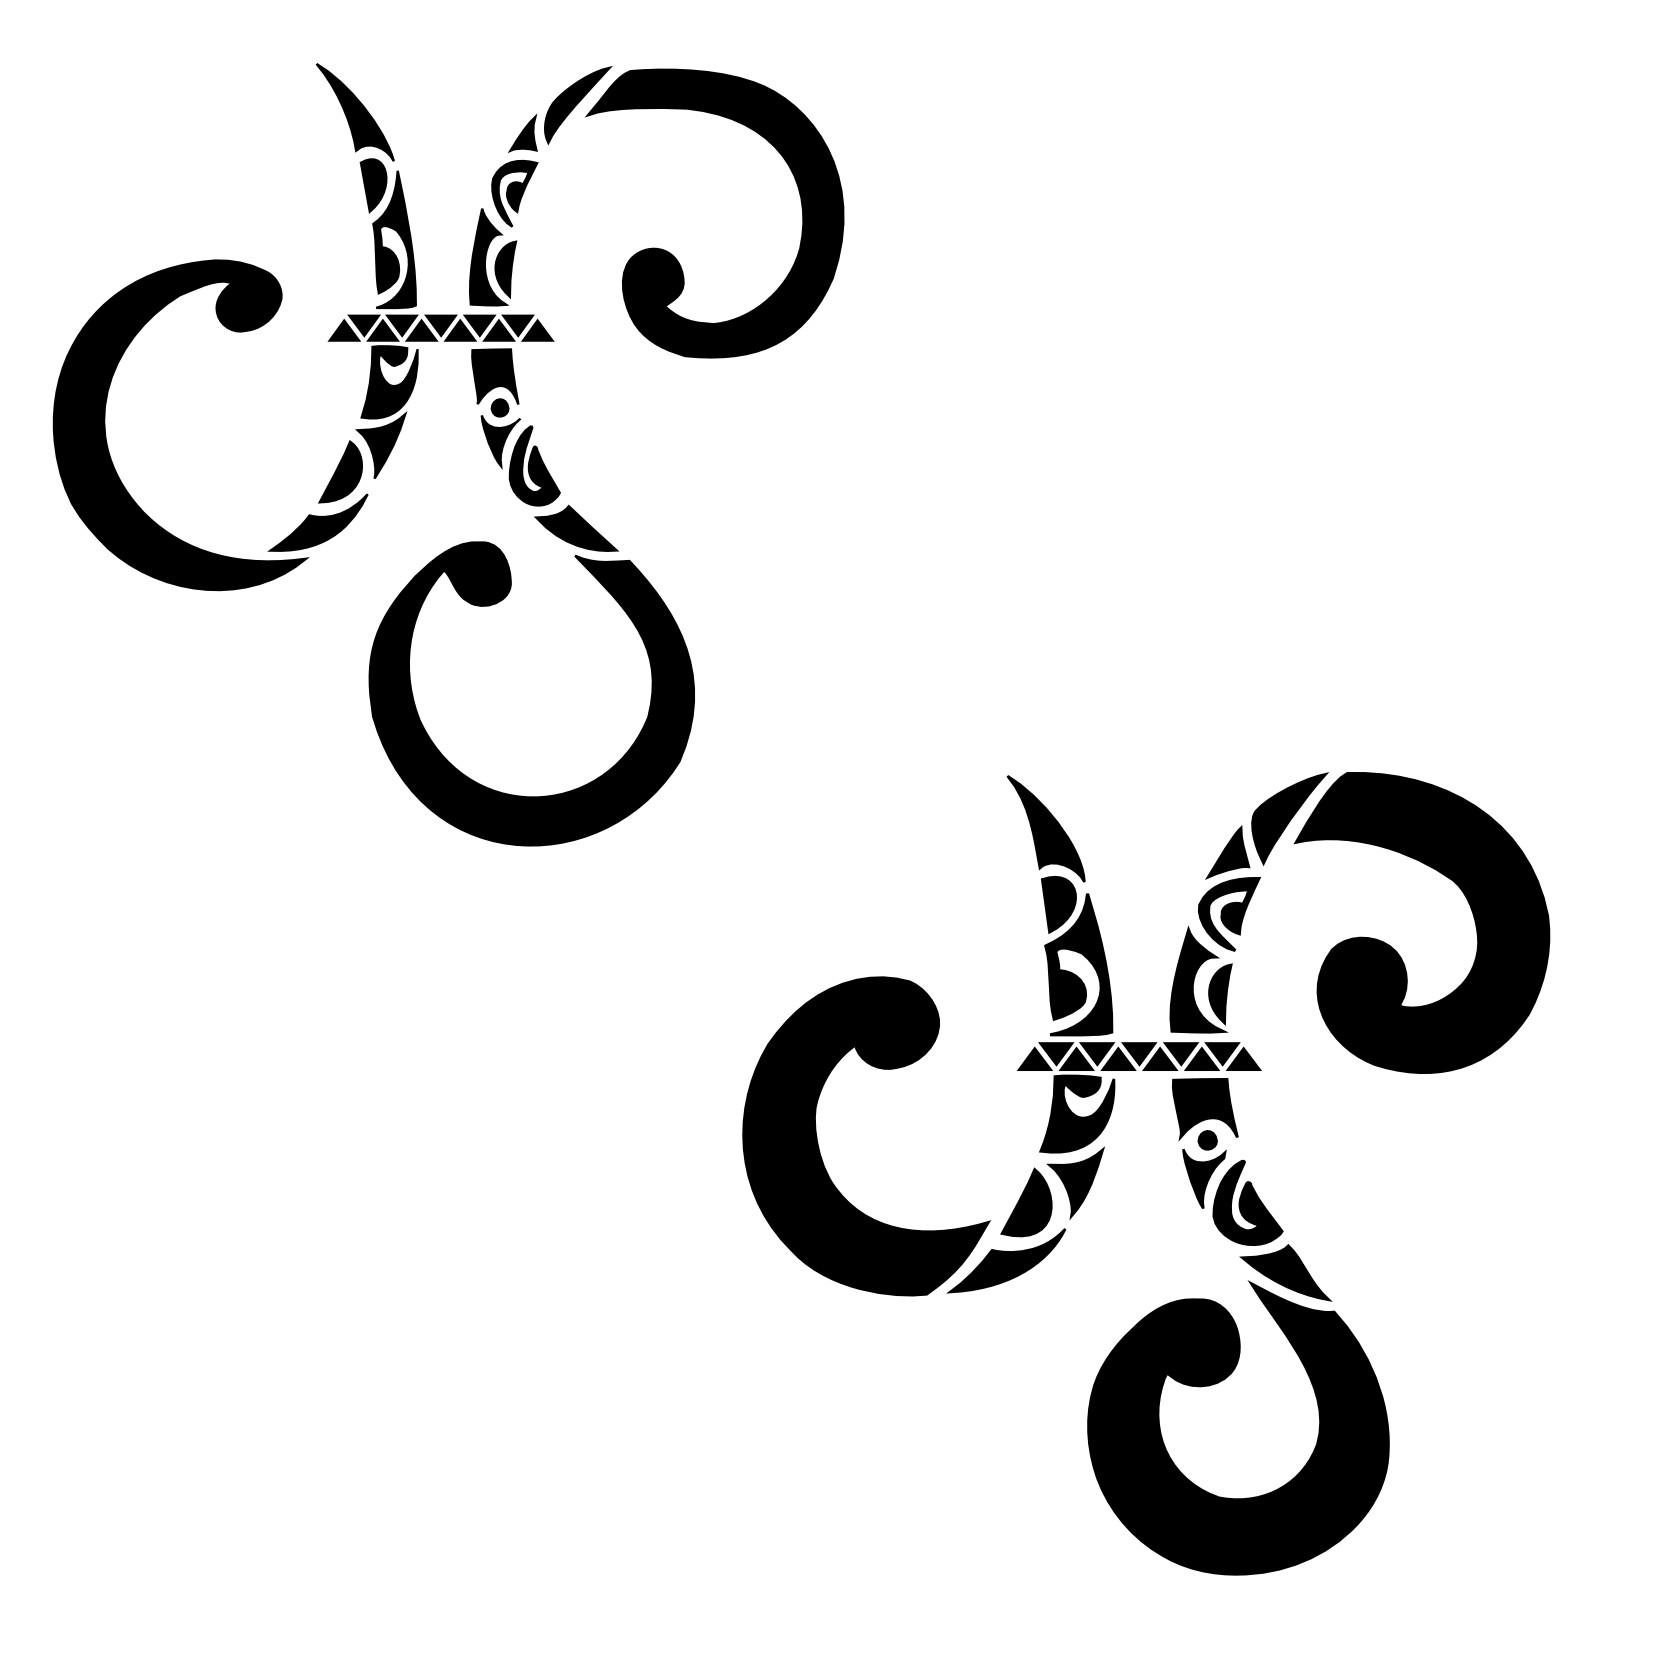 Sign tattoo designs - Pisces Tattoo Designs